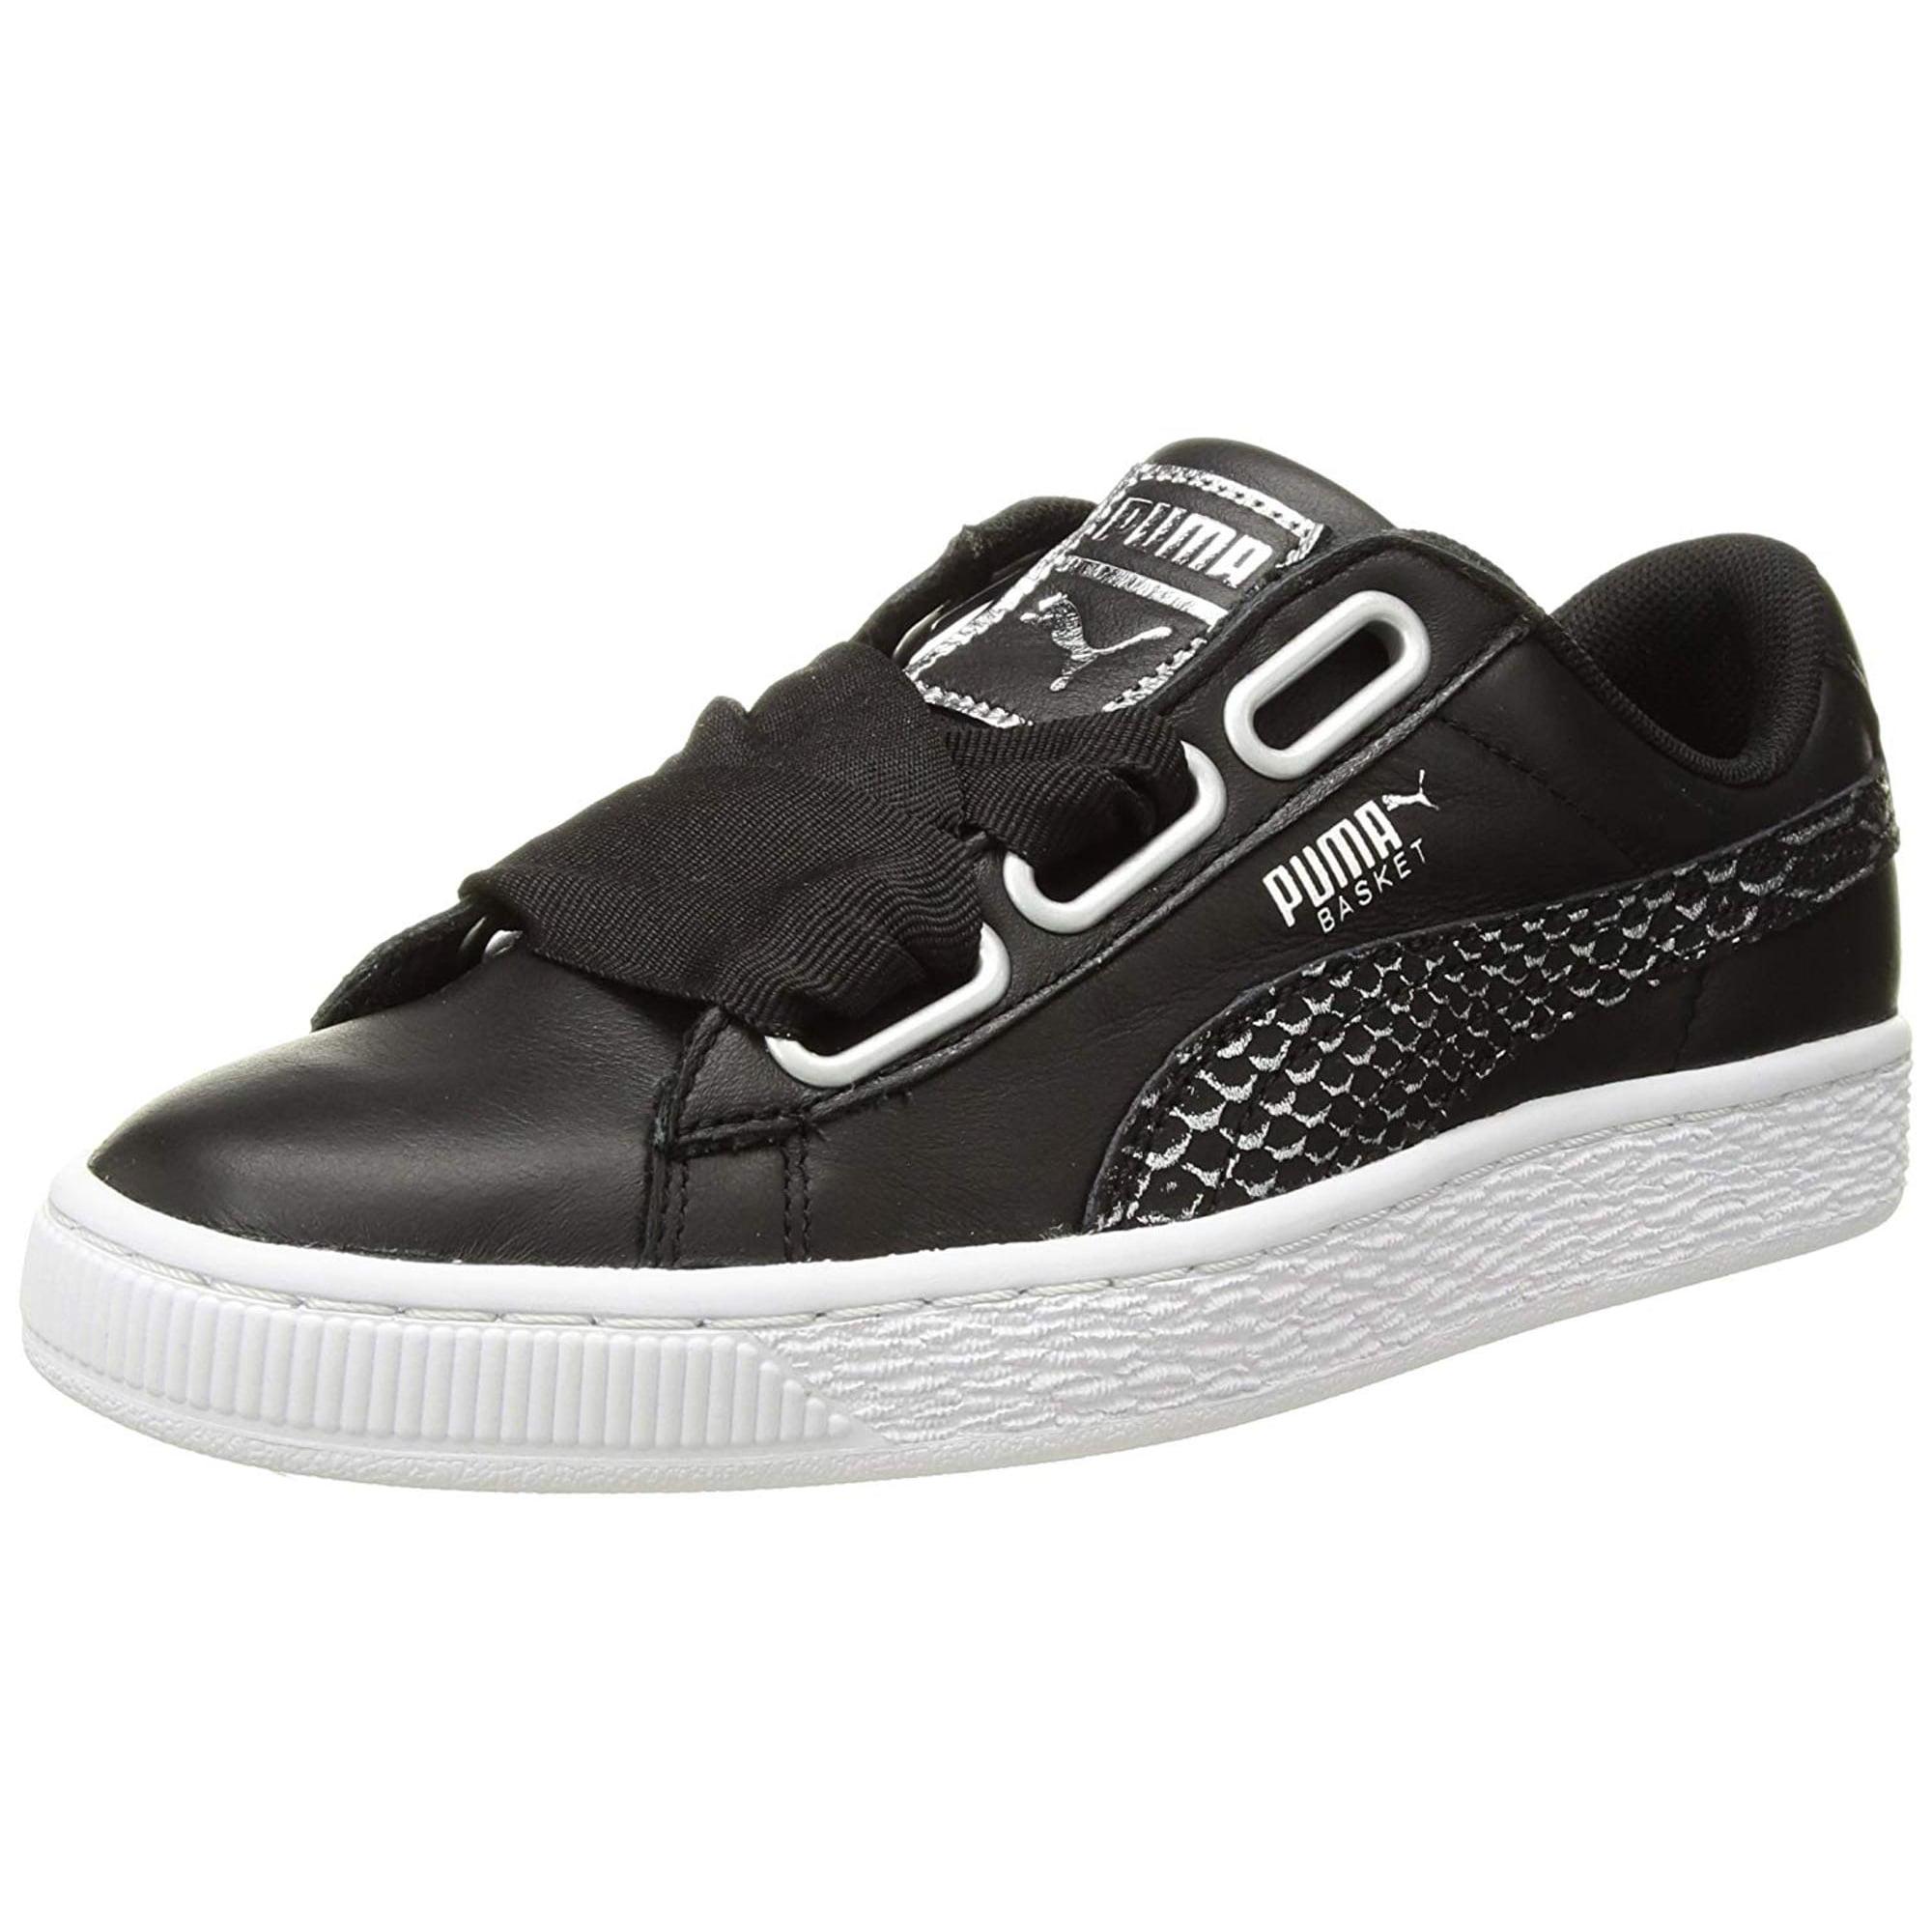 sports shoes 464ea e8f41 Puma Womens Basket Heart Oceanaire Low Top Lace Up Fashion ...